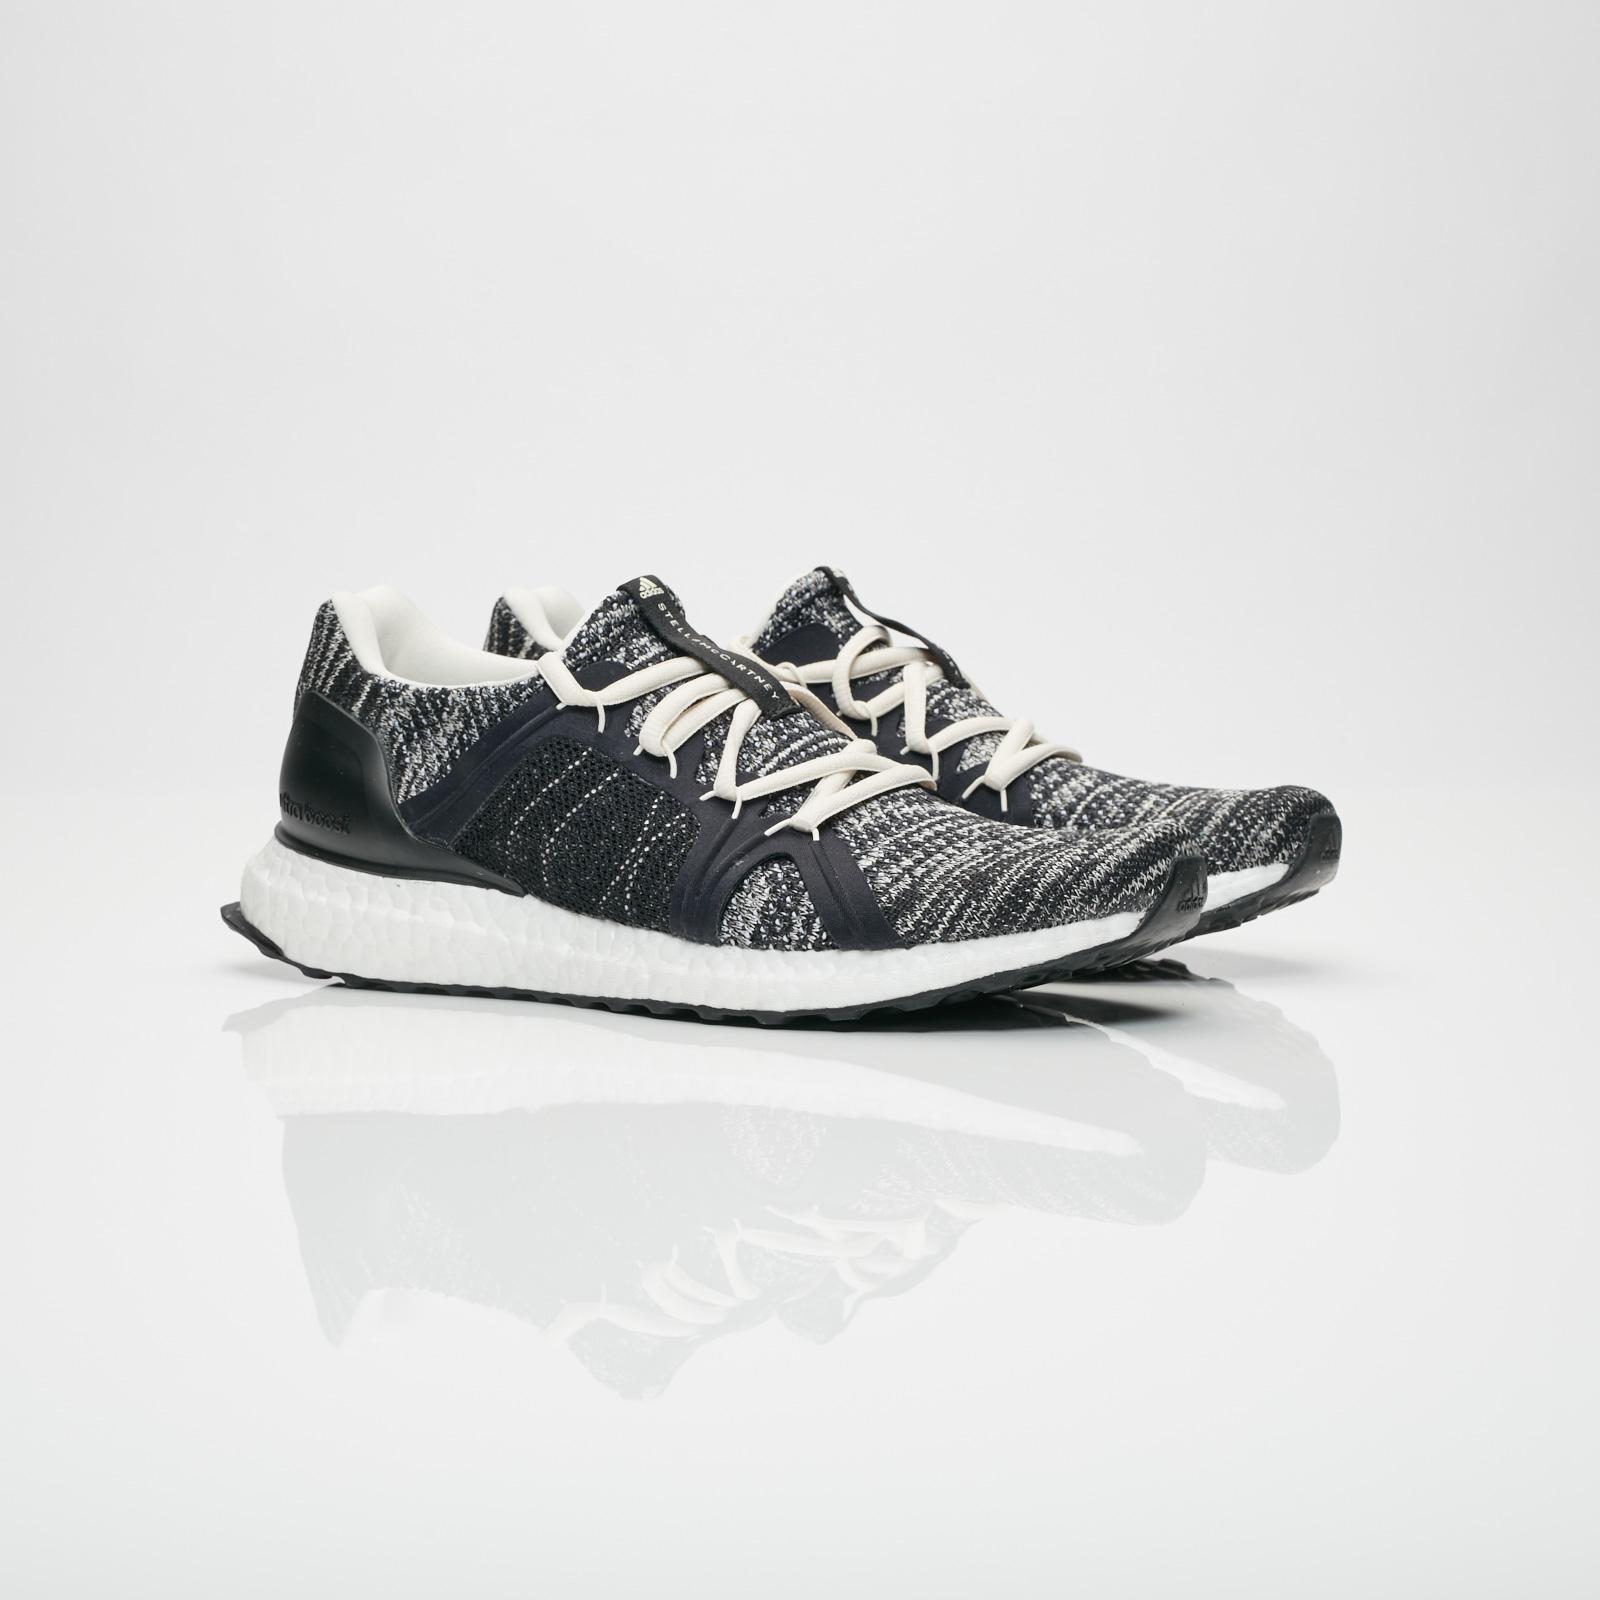 25d9b013c18 adidas UltraBOOST Parley - Bb6264 - Sneakersnstuff